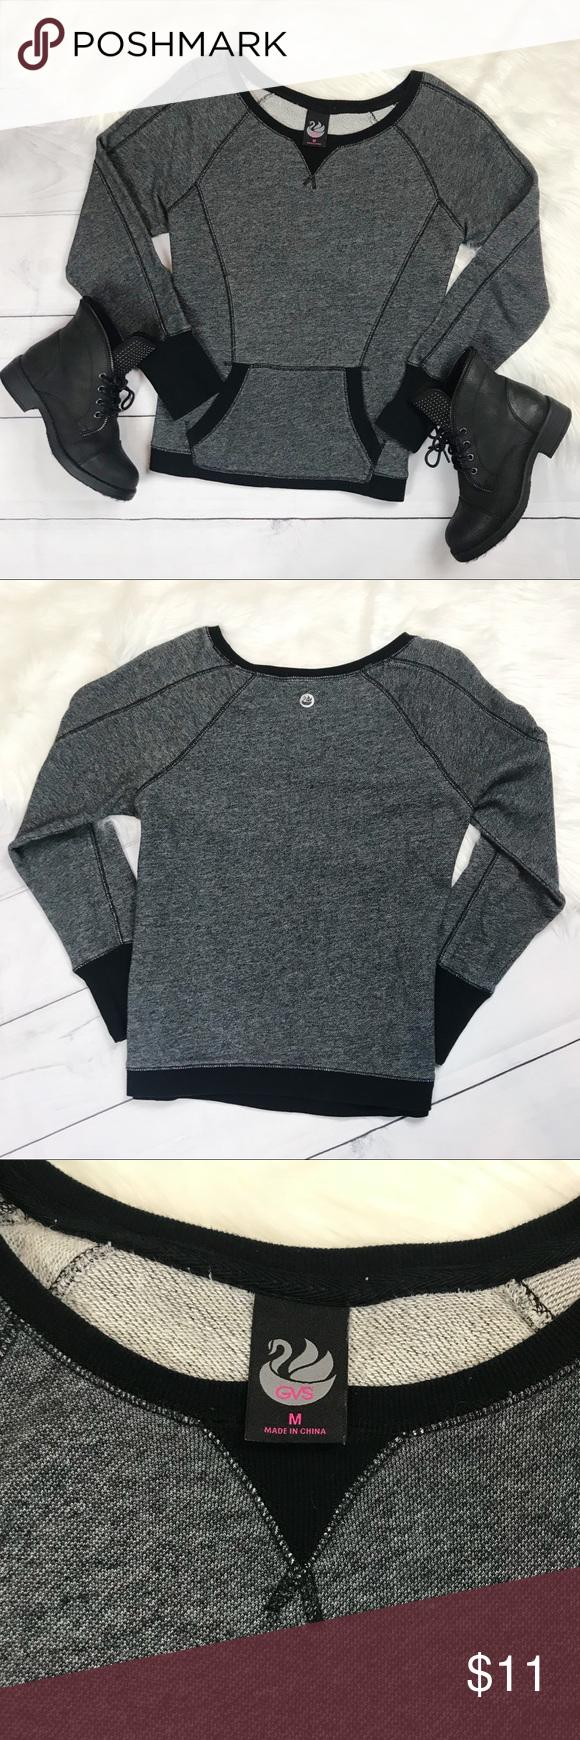 Gvs Pullover Sweatshirt Sweater Gray Black Medium Sweaters Grey Sweater Sweater Material [ 1740 x 580 Pixel ]